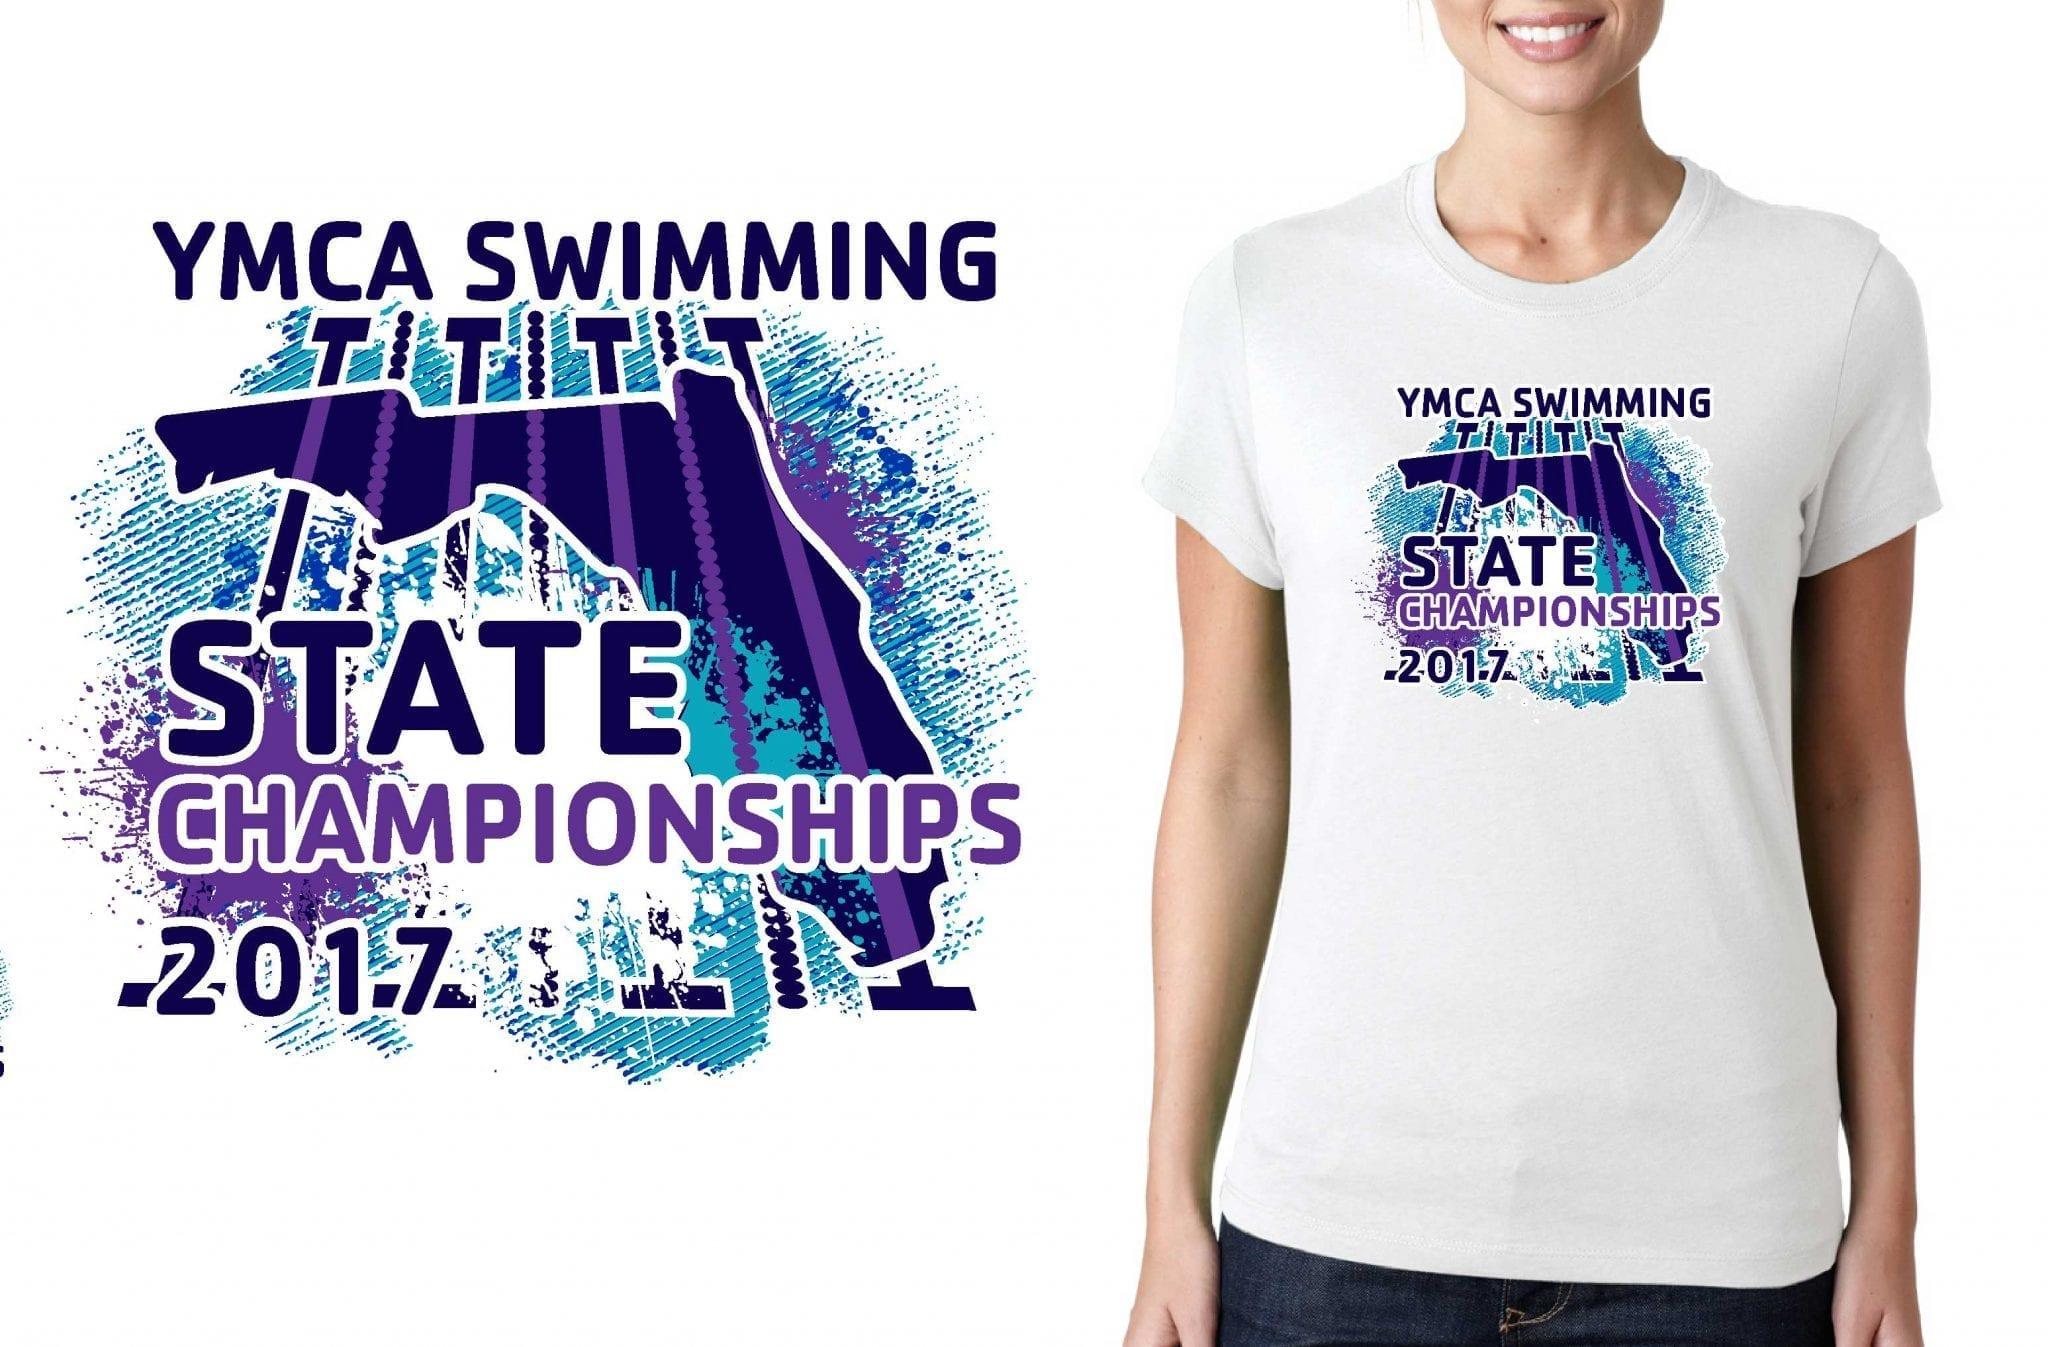 SWIMMING T SHIRT LOGO DESIGN YMCA-Swimming-State-Championships BY UrArtStudio